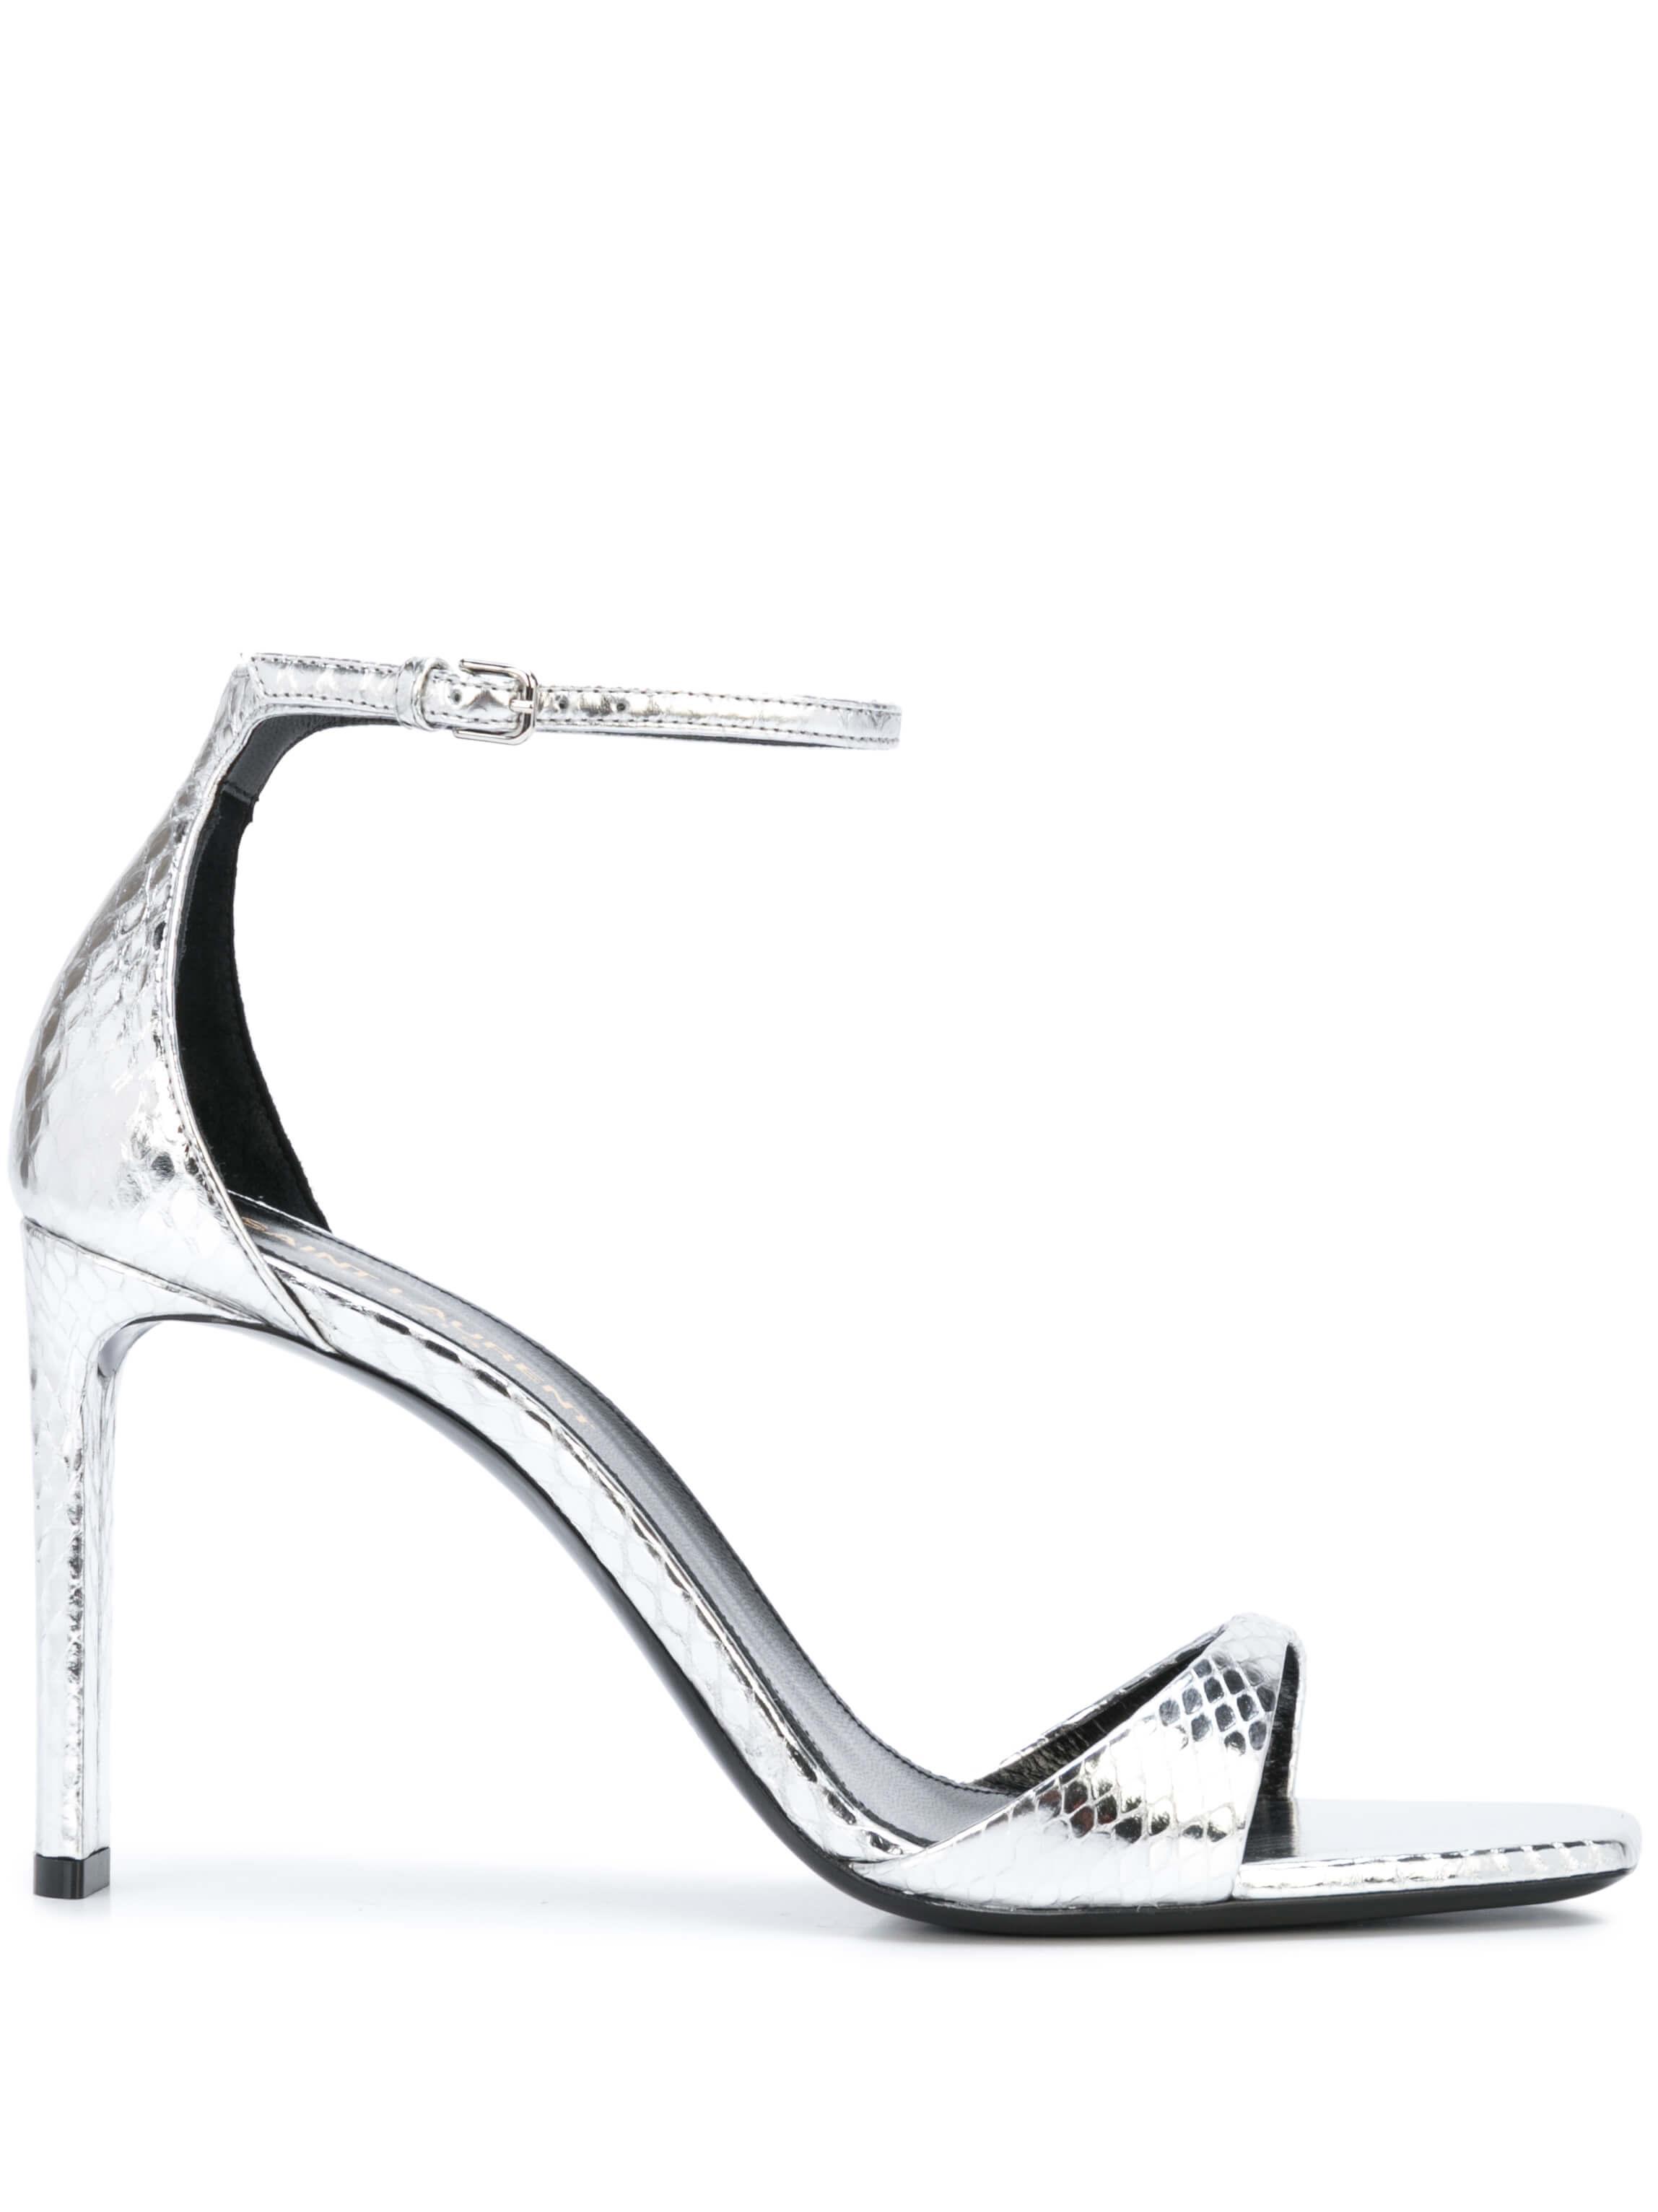 Bea 90mm Ankle Strap Sandal Item # 612329EXV00